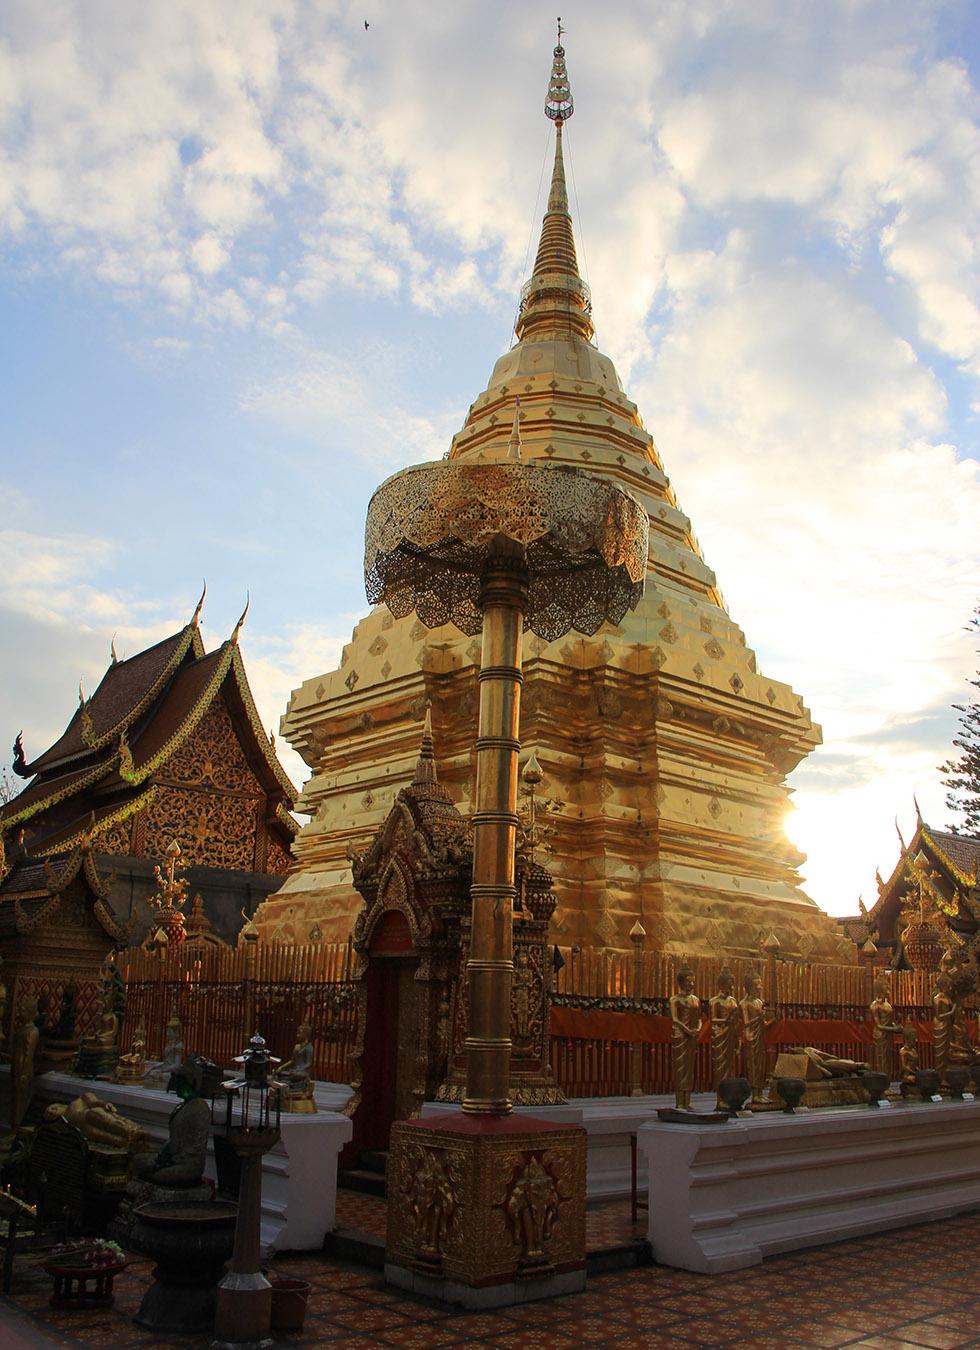 Pagoda at Doi Suthep